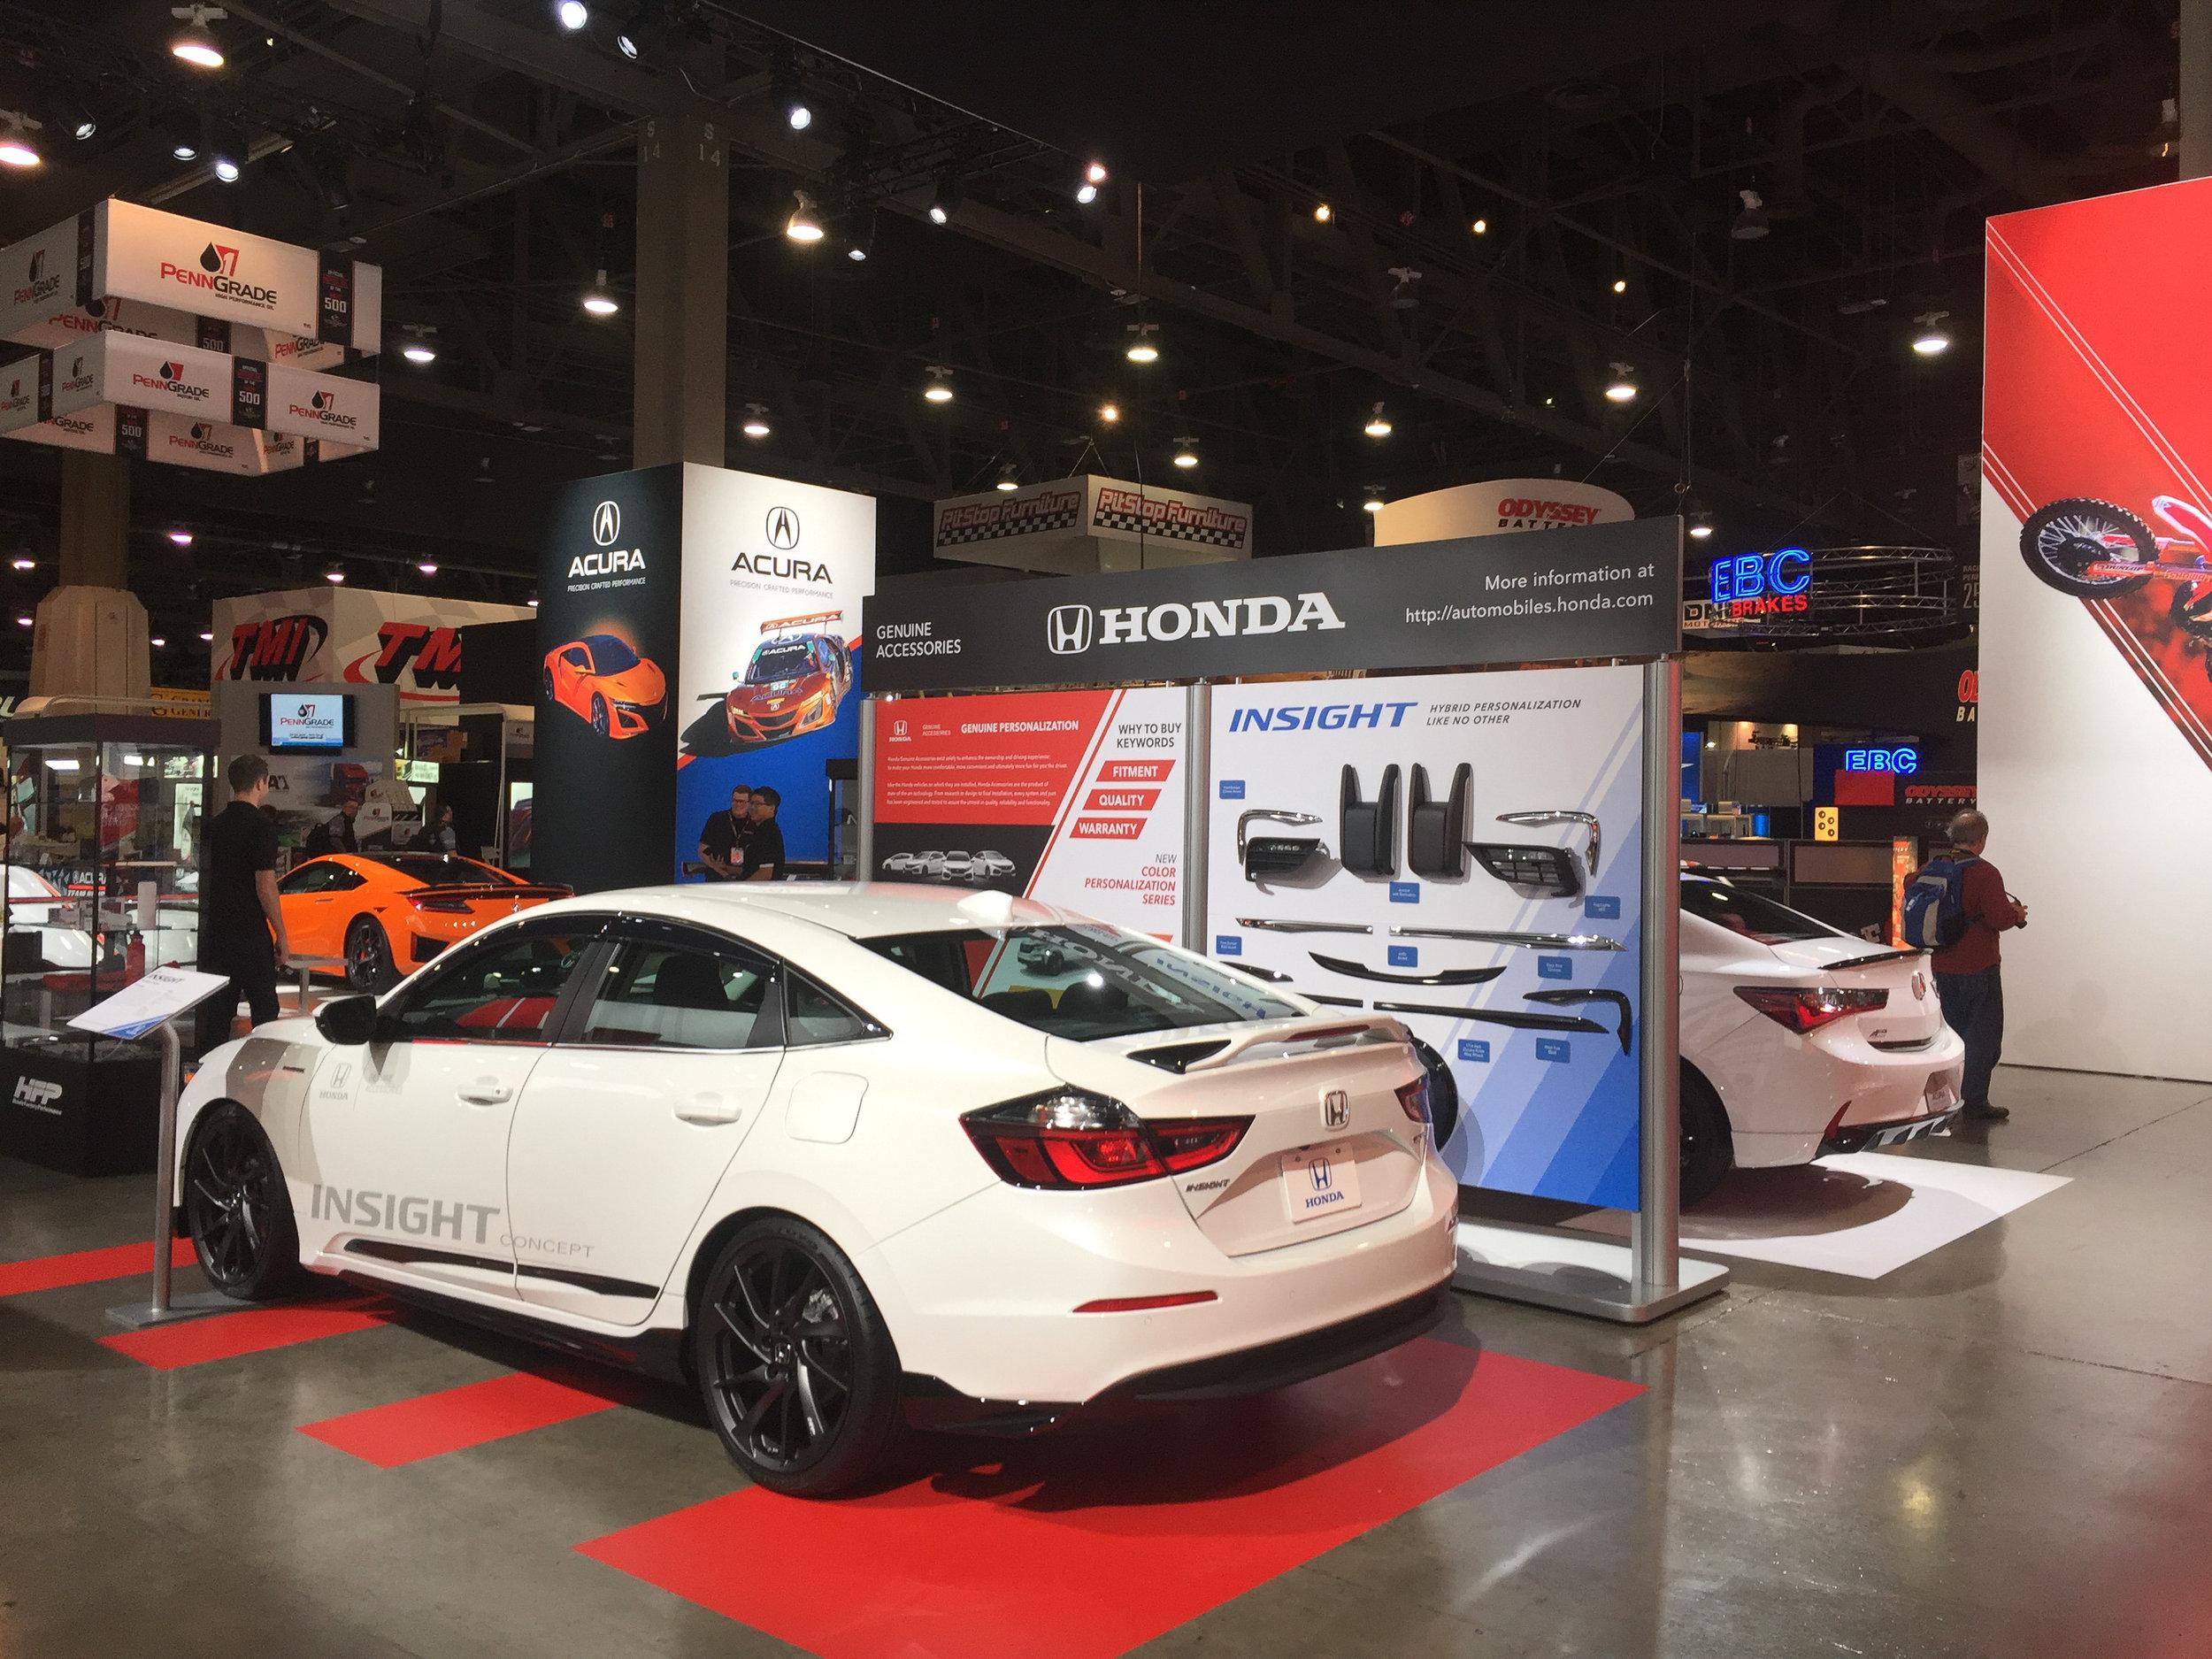 Product Accessory Display, Honda Insight + Graphics Side, Honda+Acura & GPJ, 2018